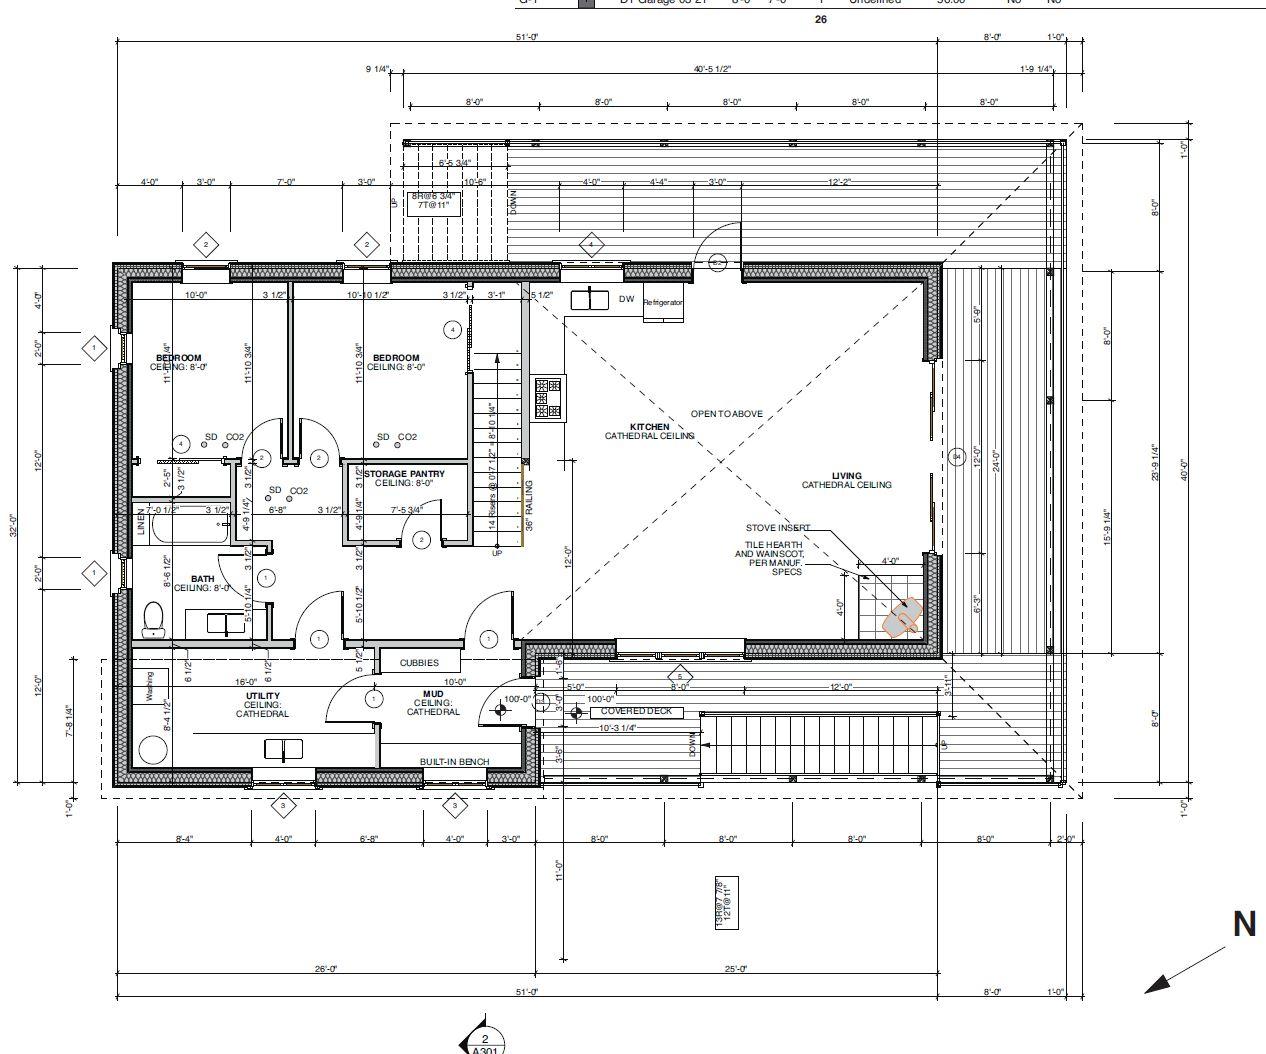 Small Haus Large 1800 1st Floor